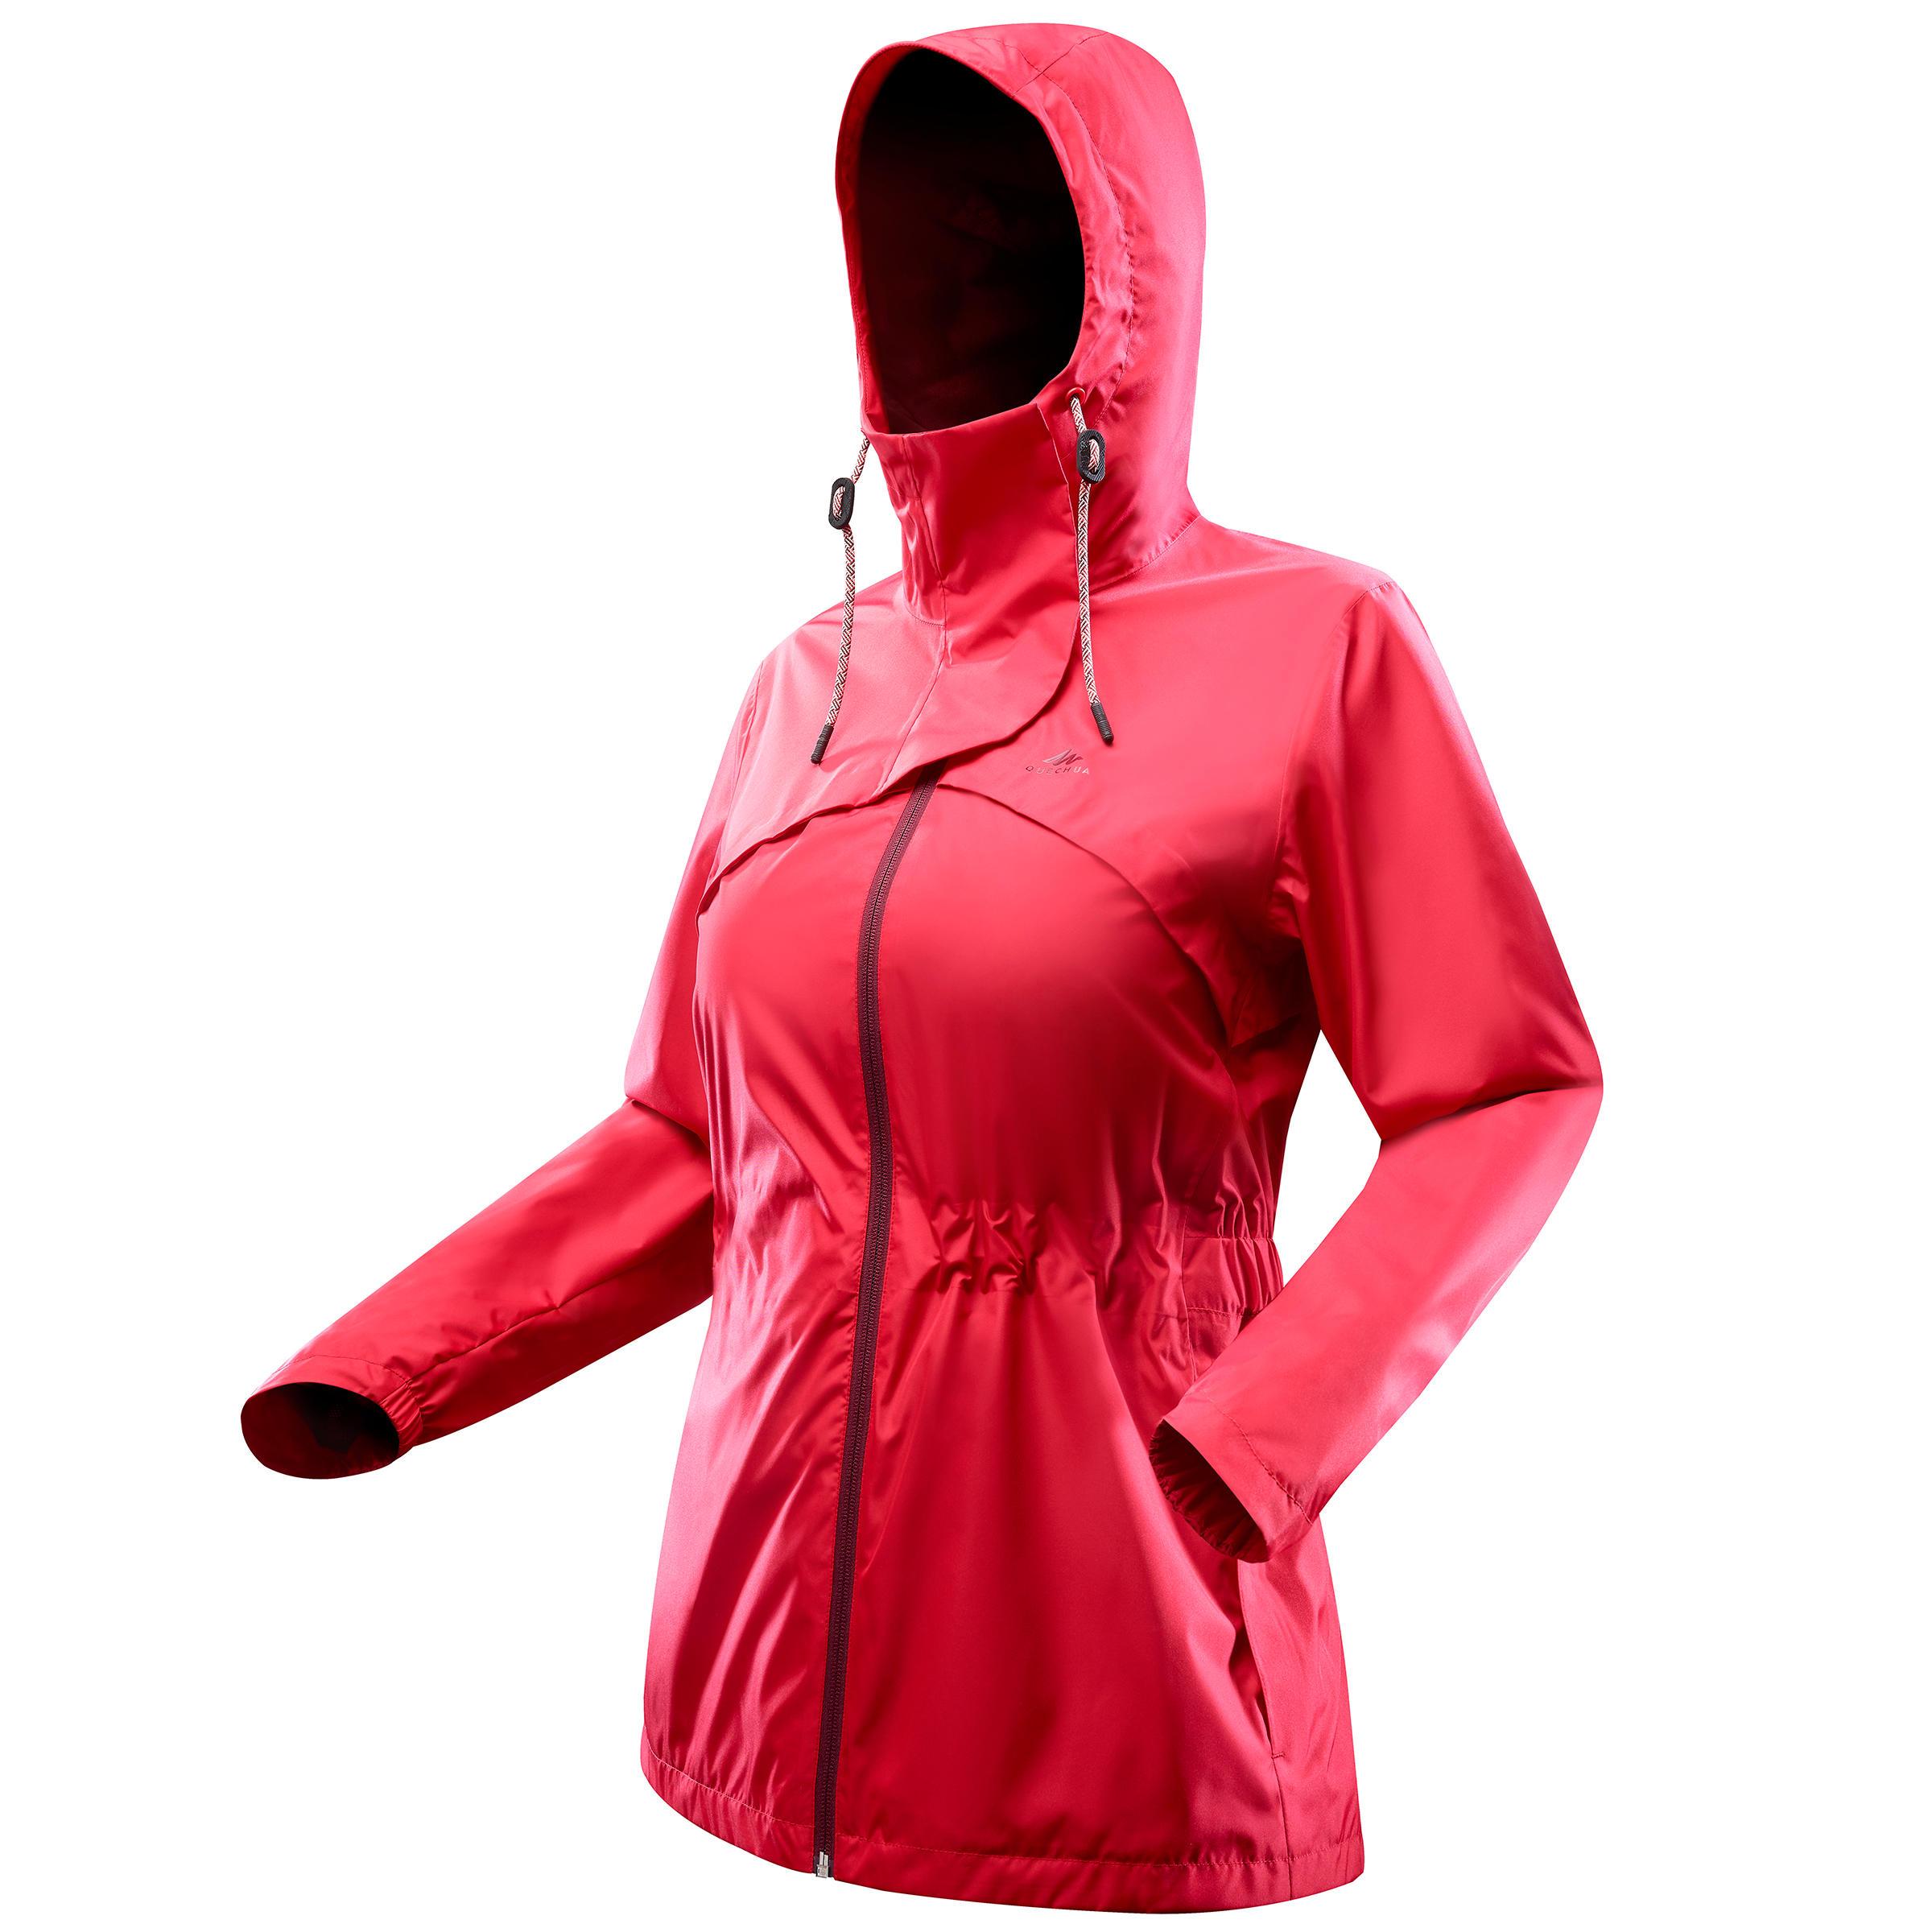 Veste impermeable rouge femme